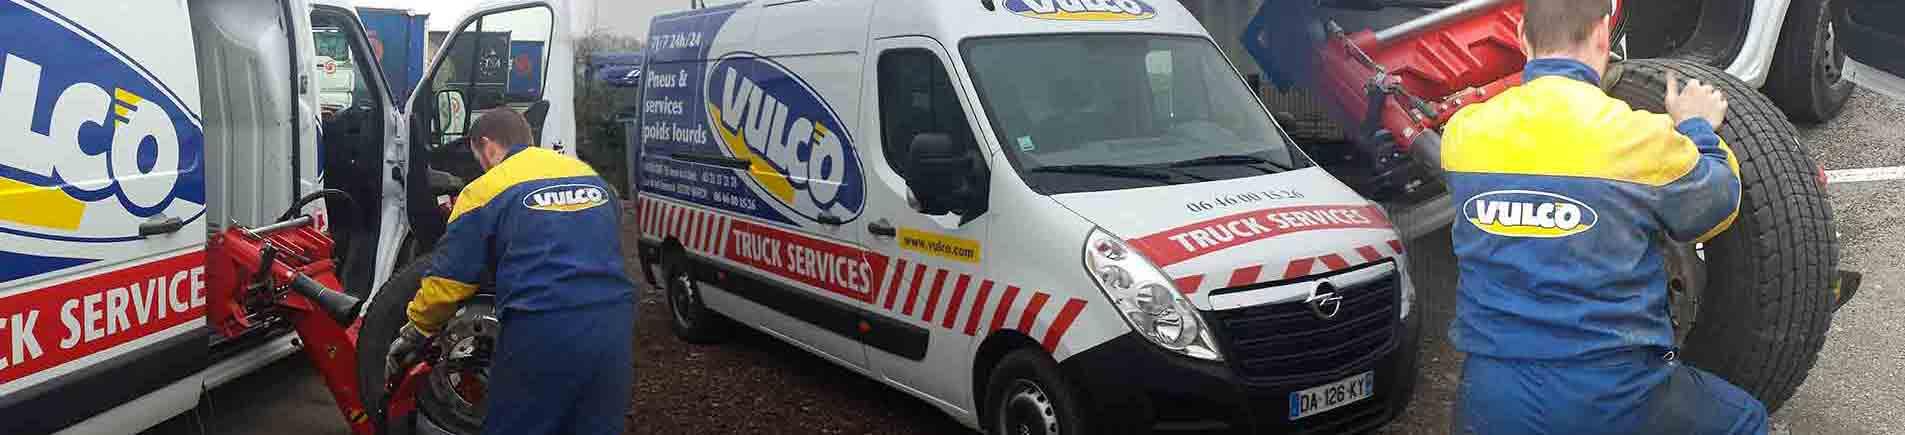 bg service pneumatique Vulco